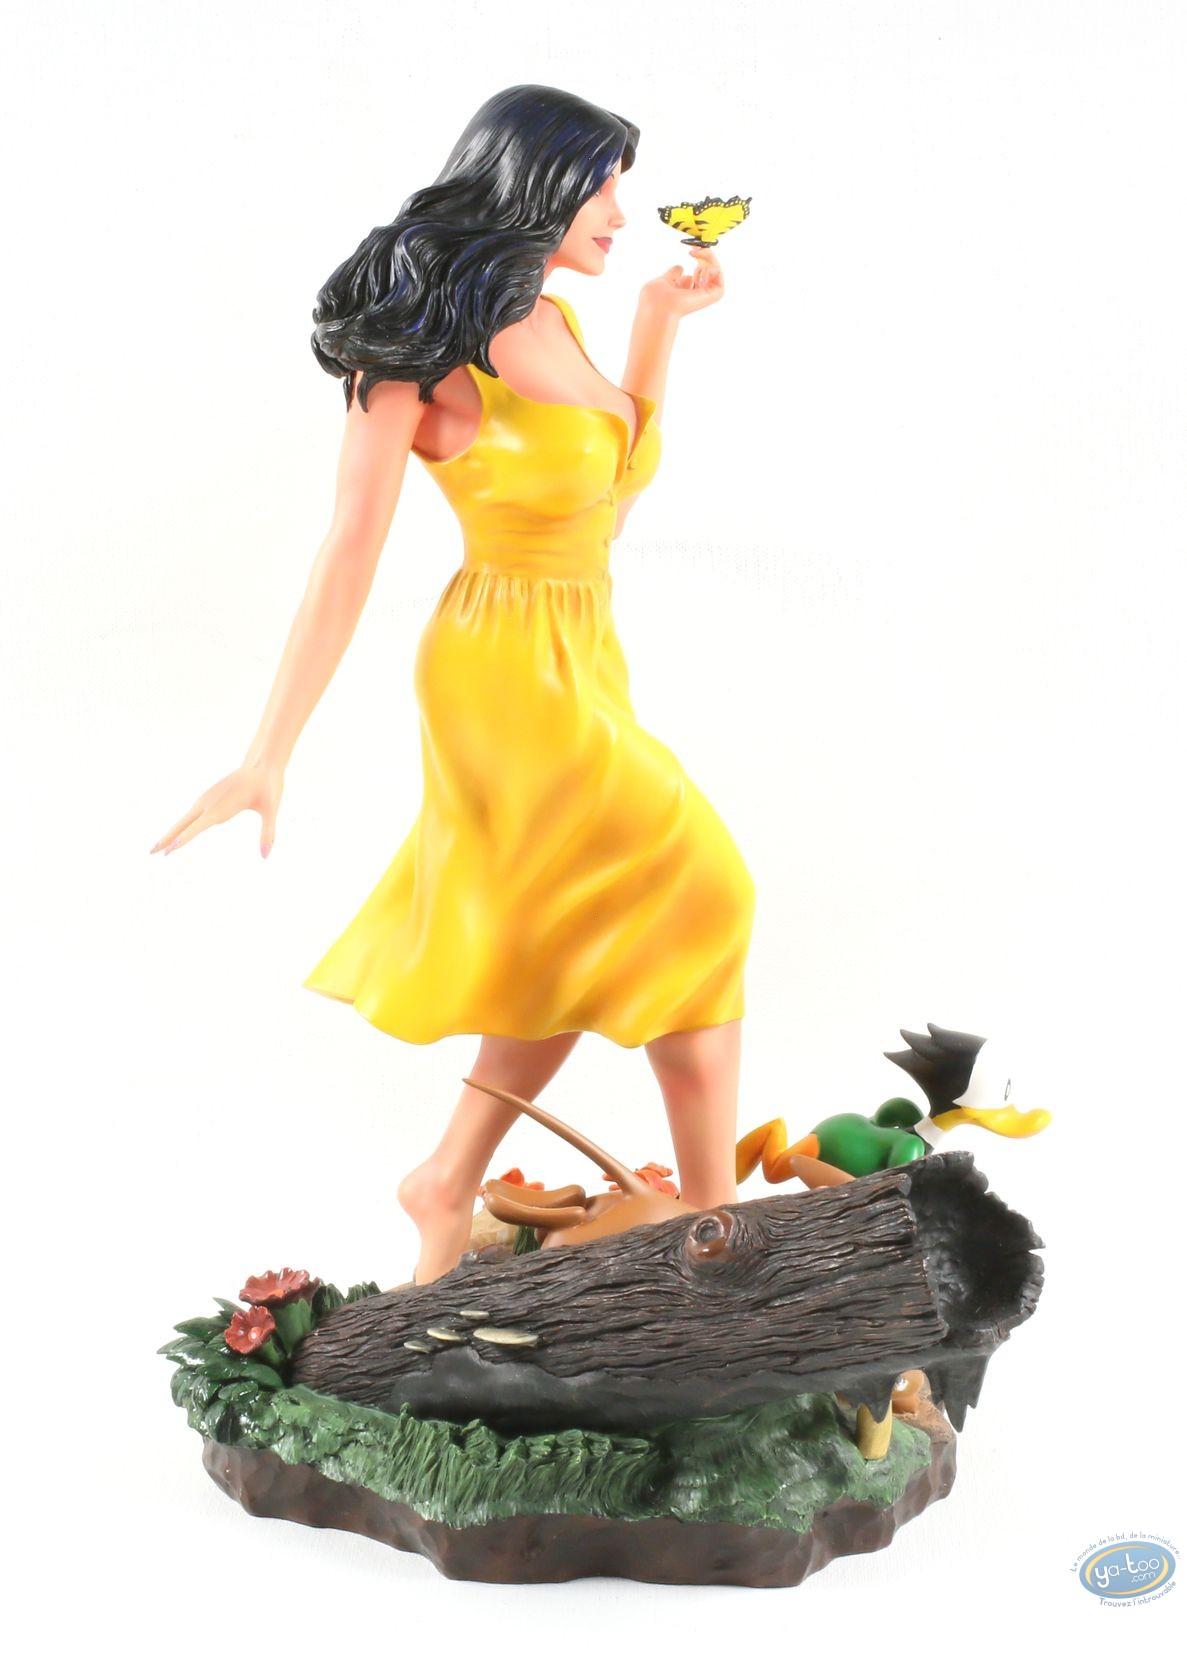 Resin Statuette, Liberty Meadows : Liberty Meadows : Brandy statue